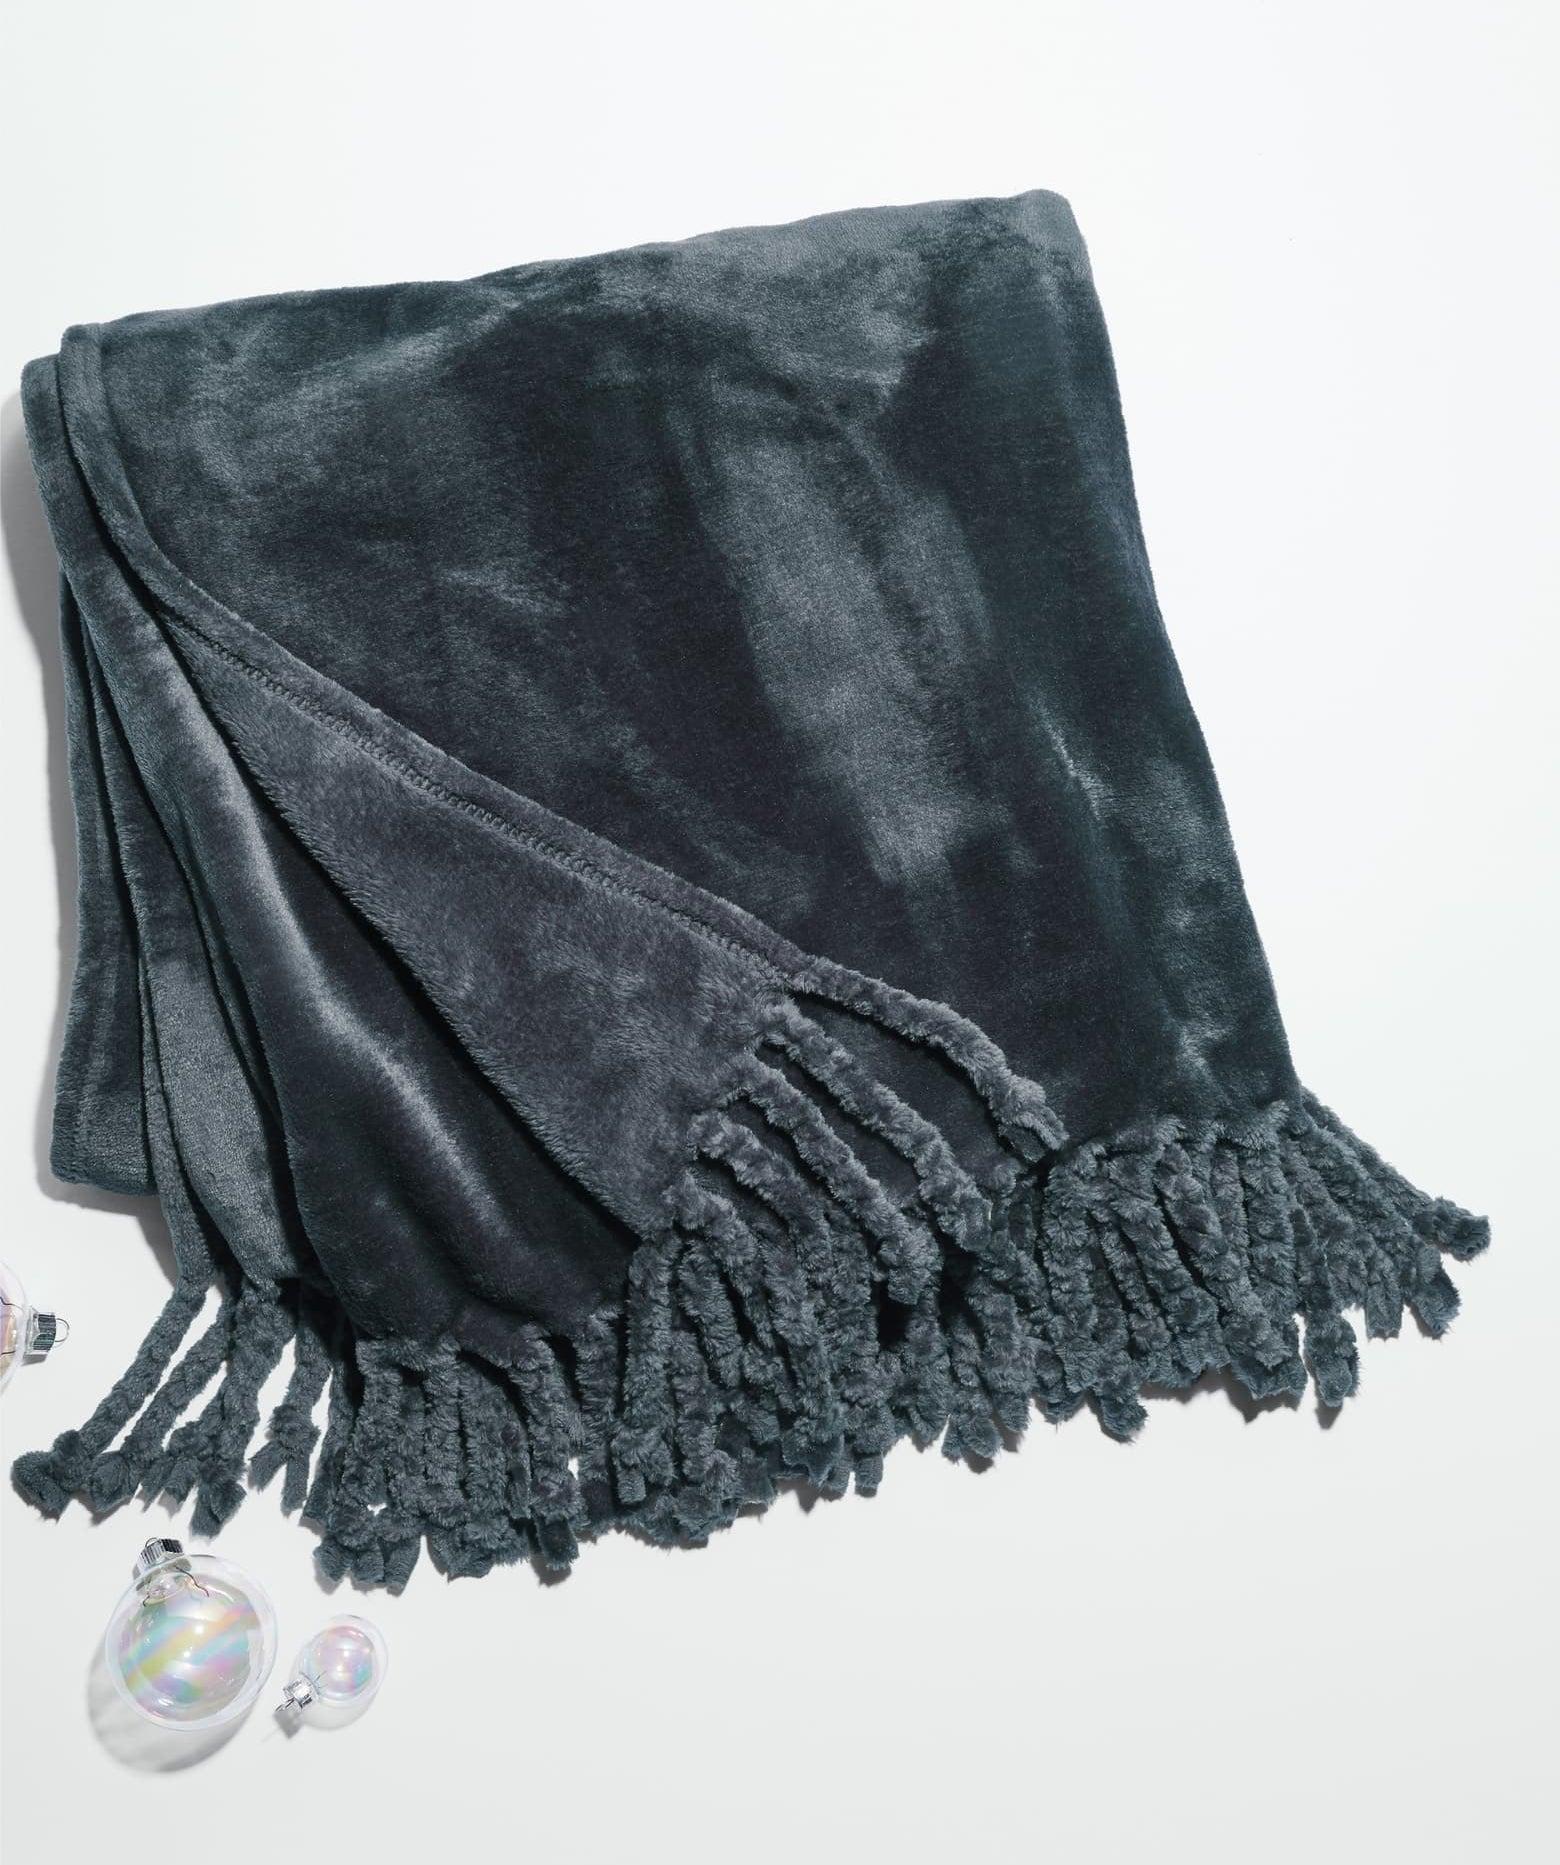 Grey plush blanket with fringe on the end